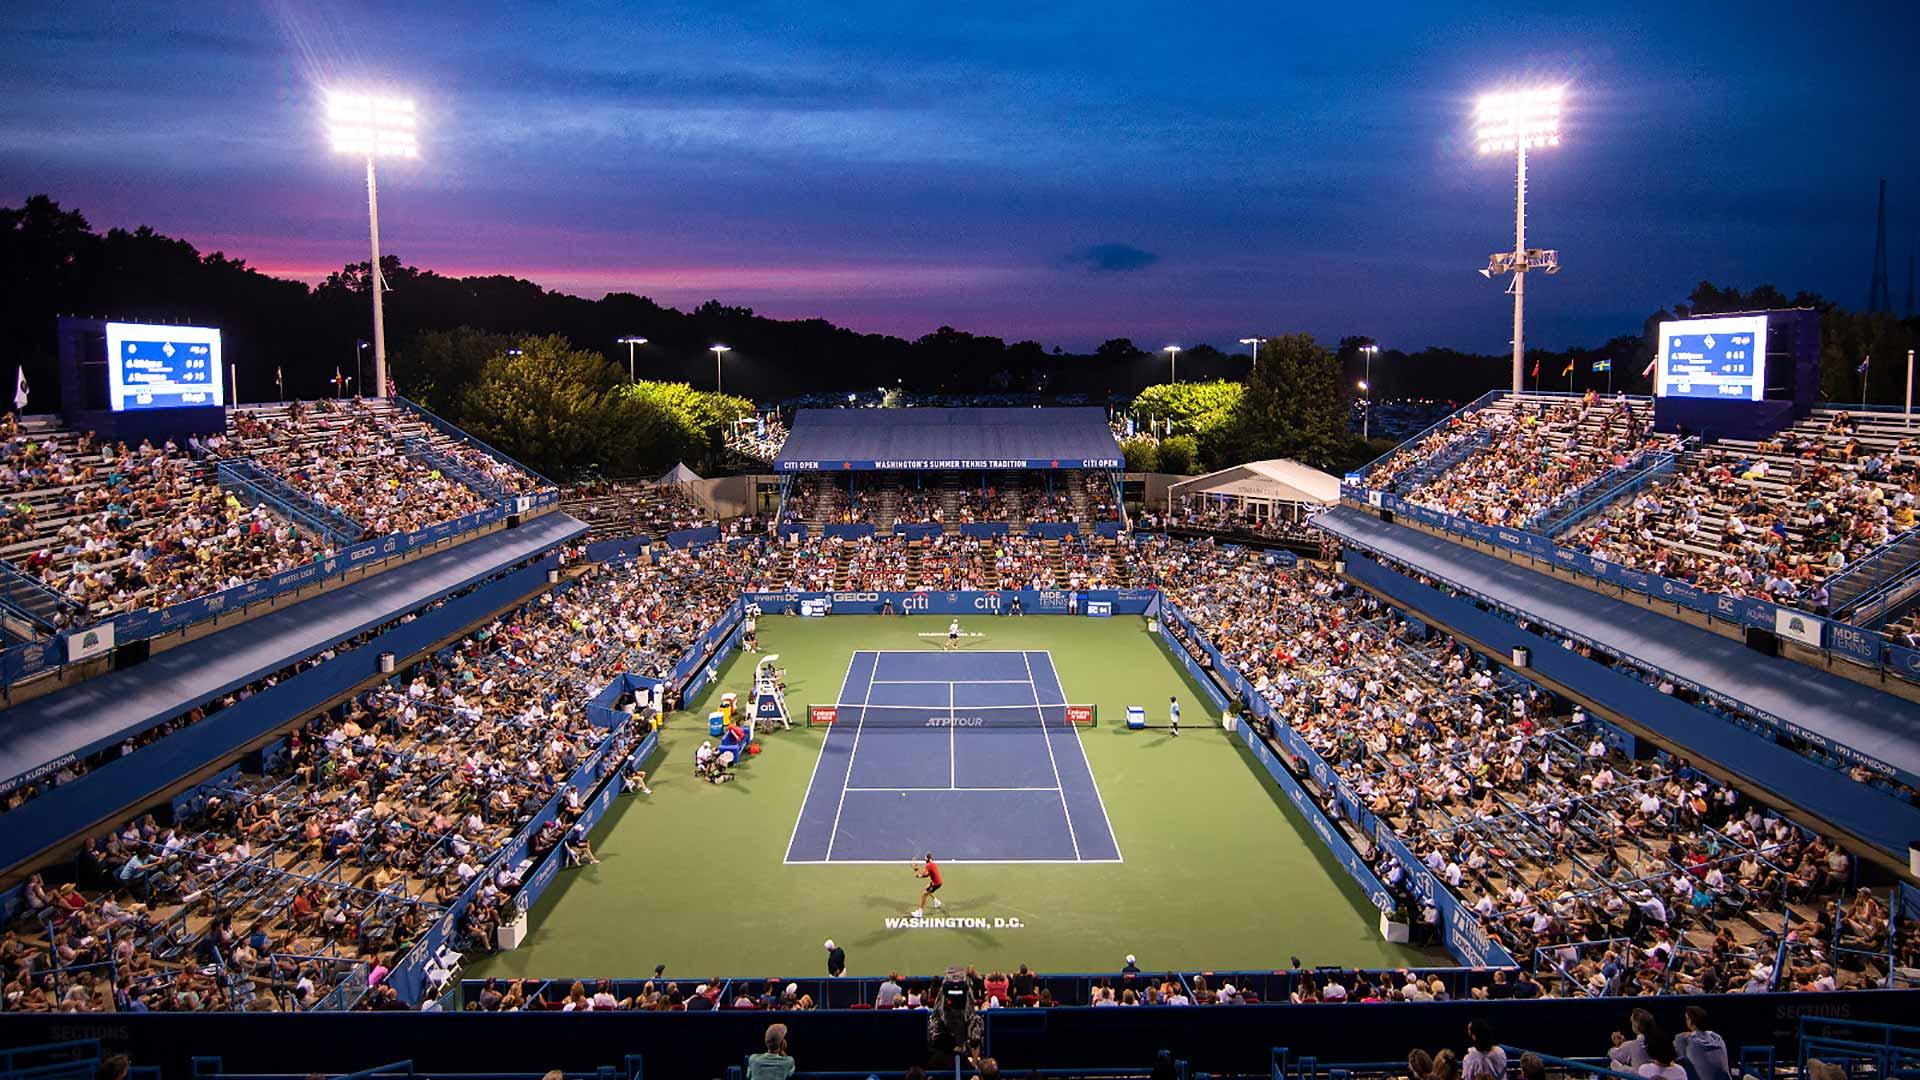 ATP Announces Cancellation Of The 2020 Citi Open | ATP Tour